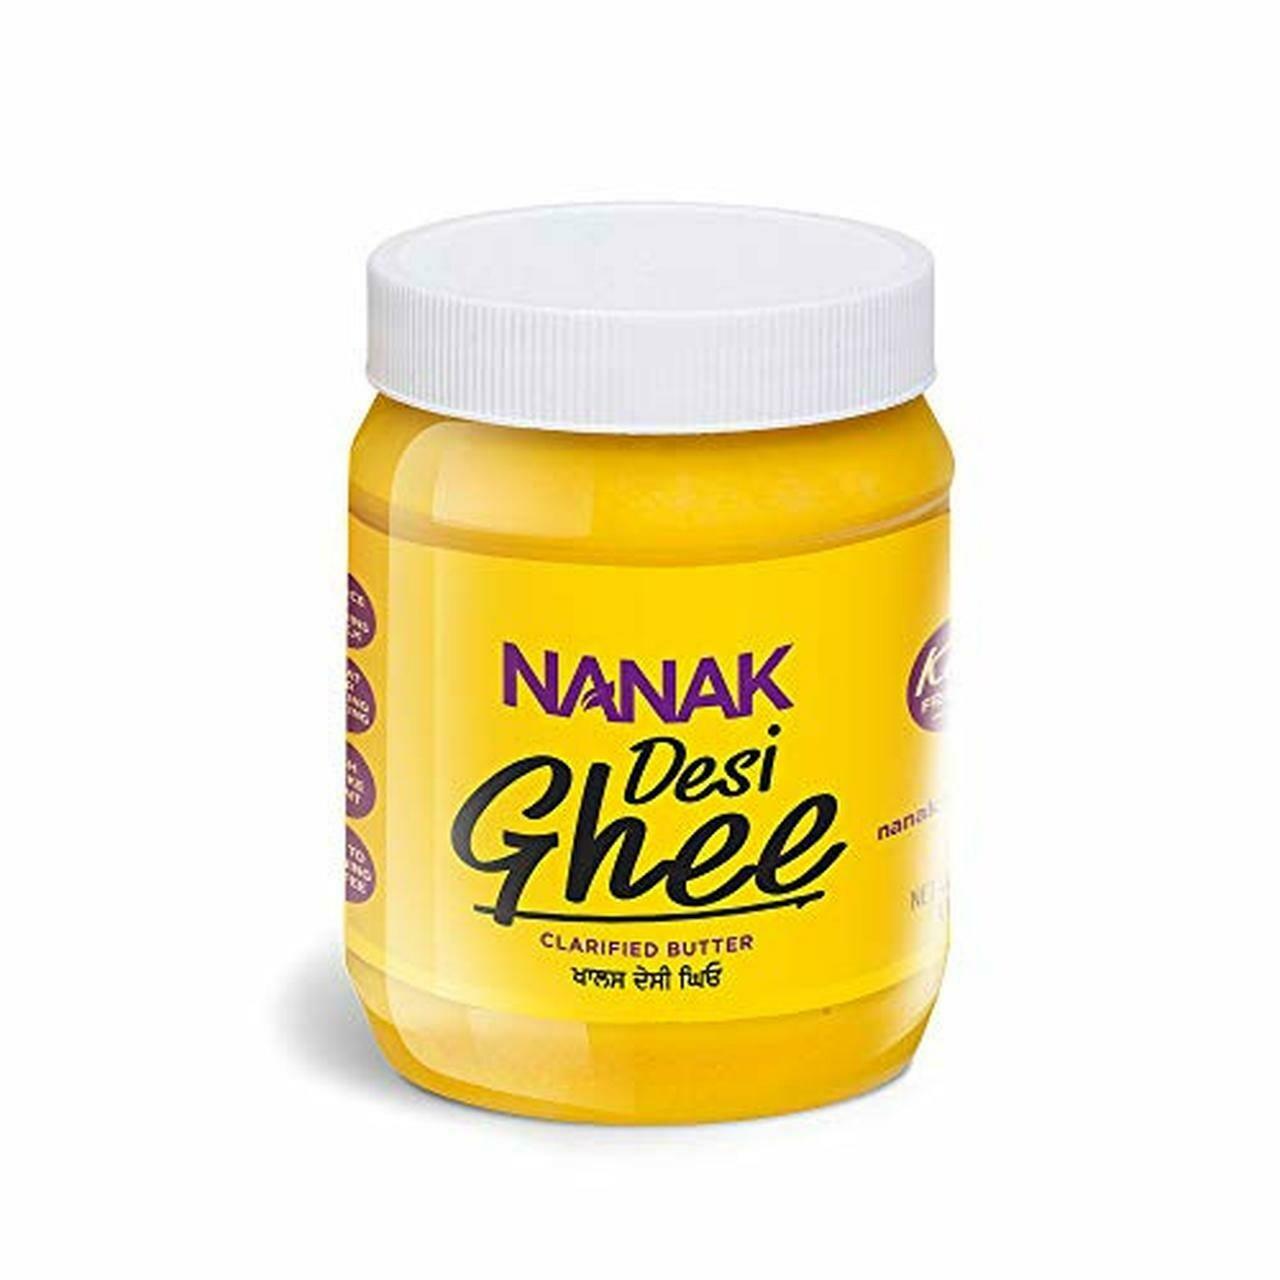 DESI GHEE PURE NANAK 400G